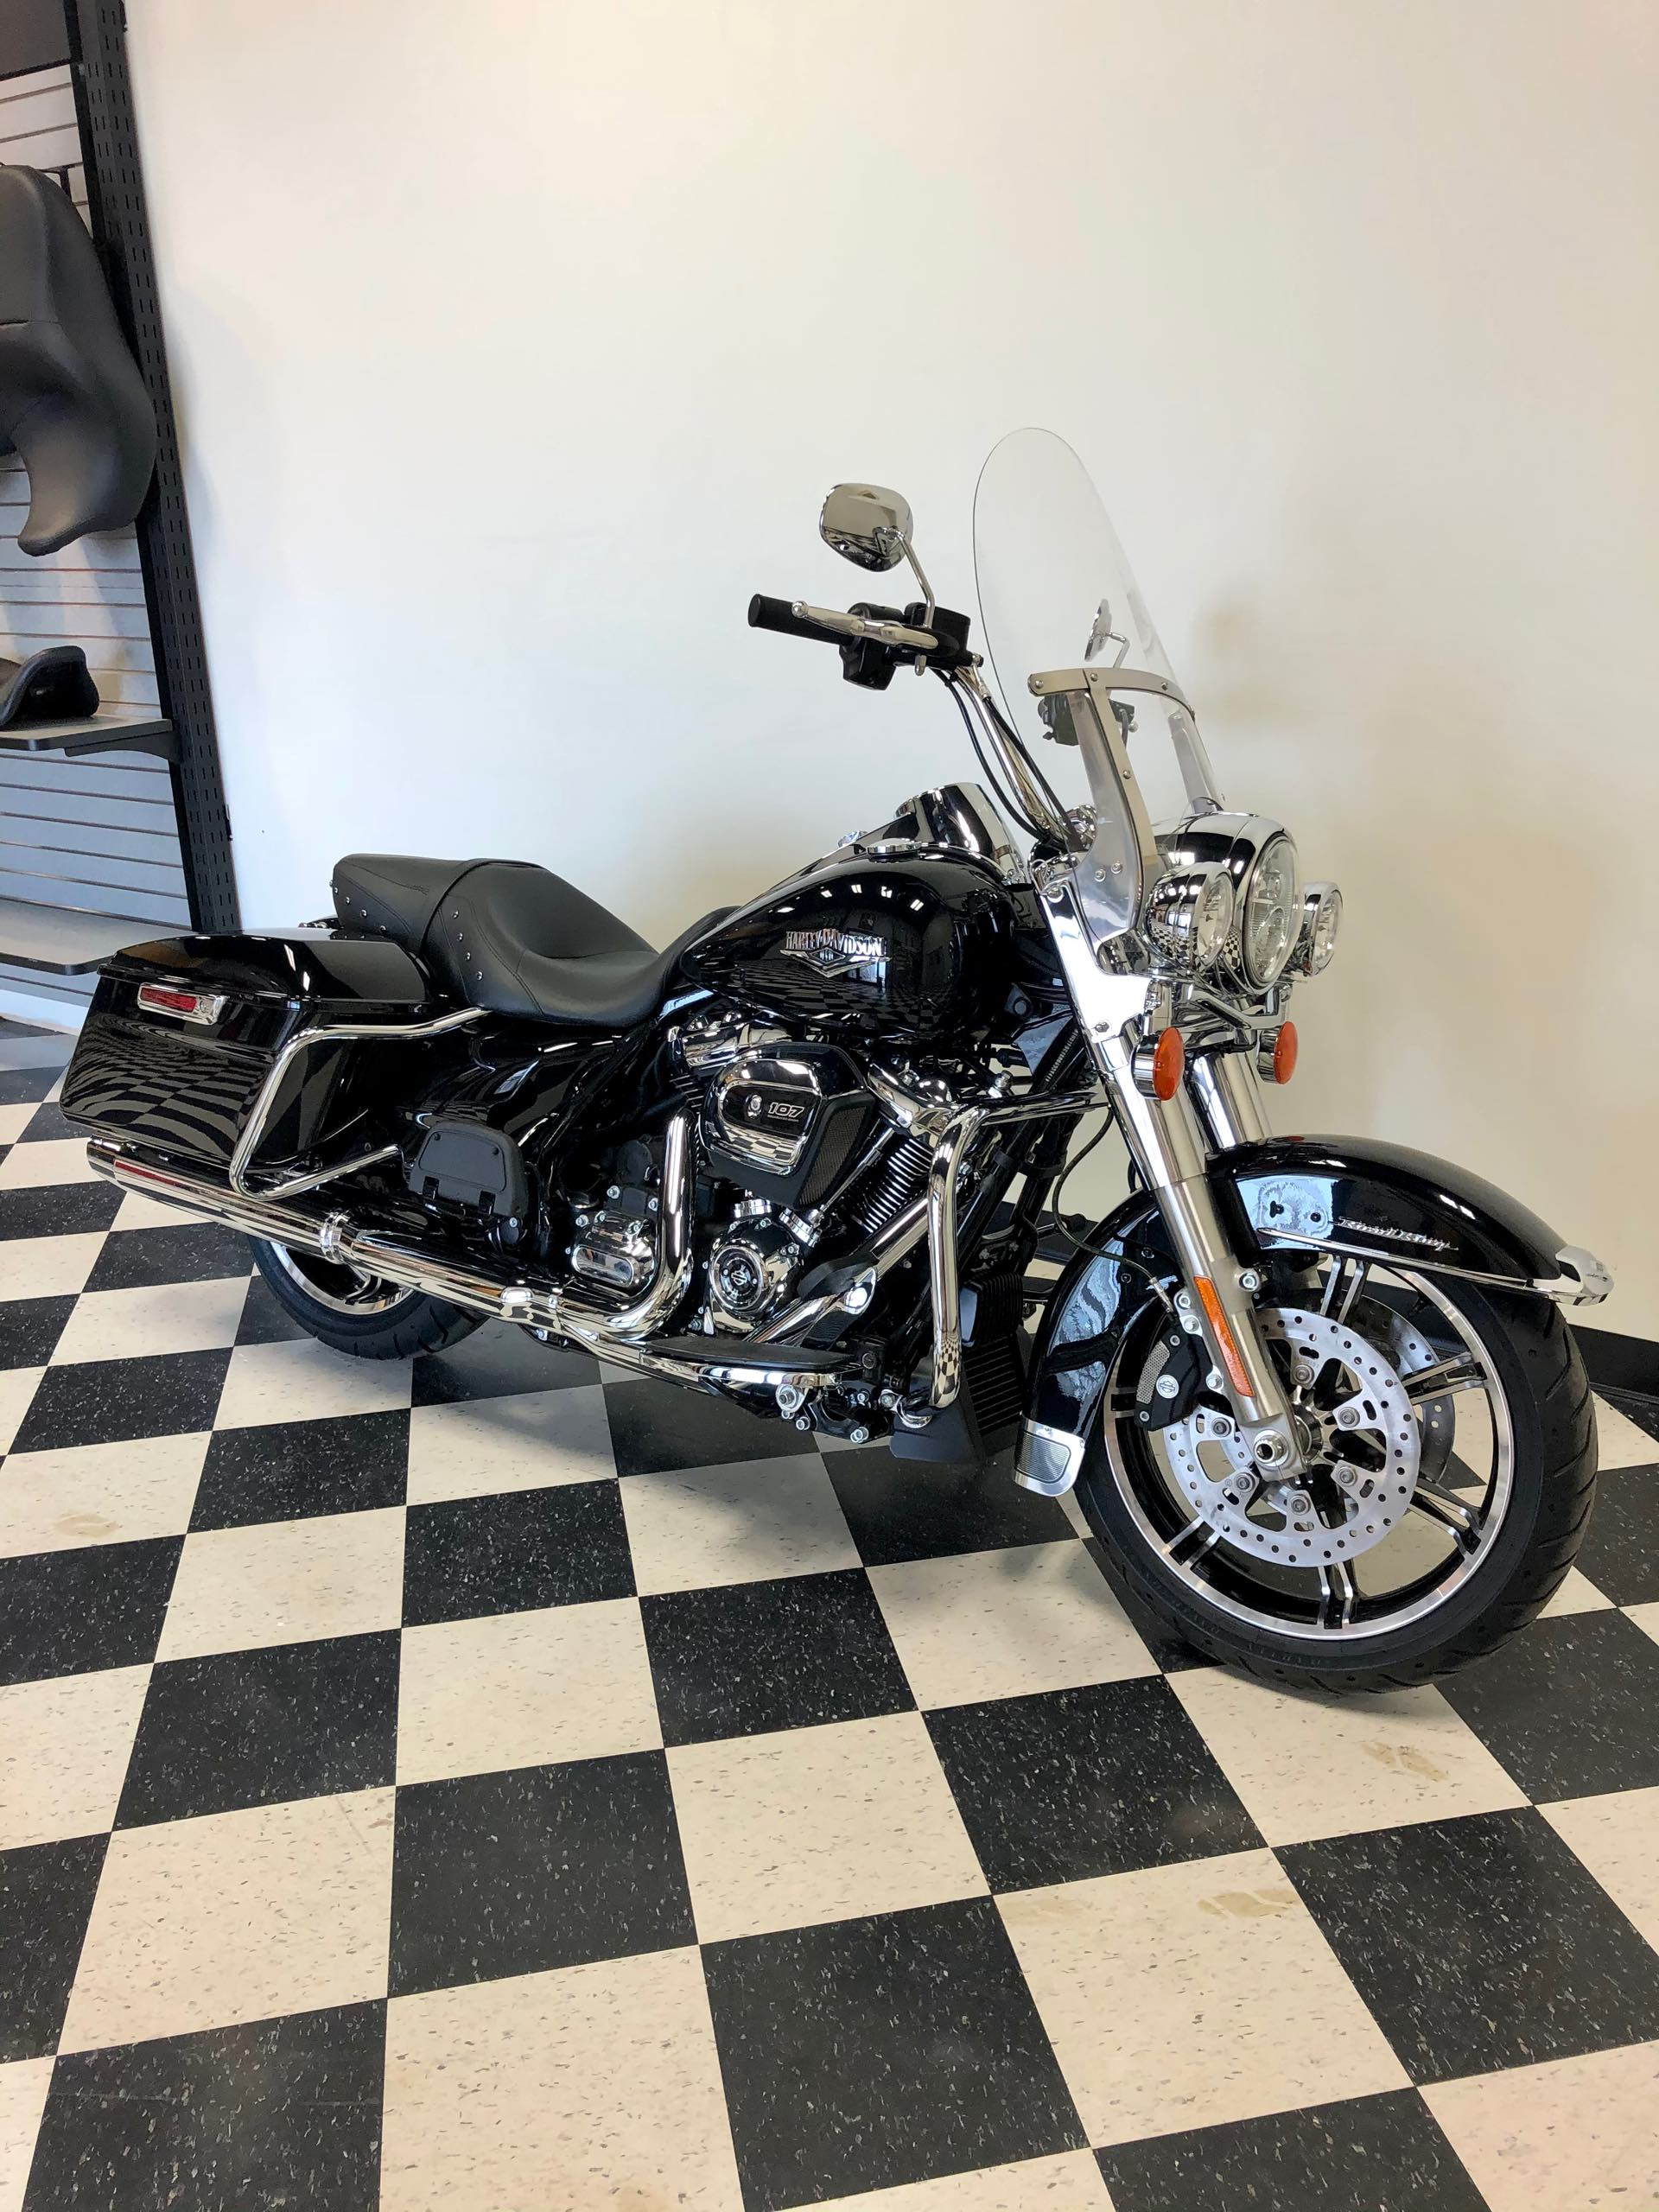 2021 Harley-Davidson Touring Road King at Deluxe Harley Davidson